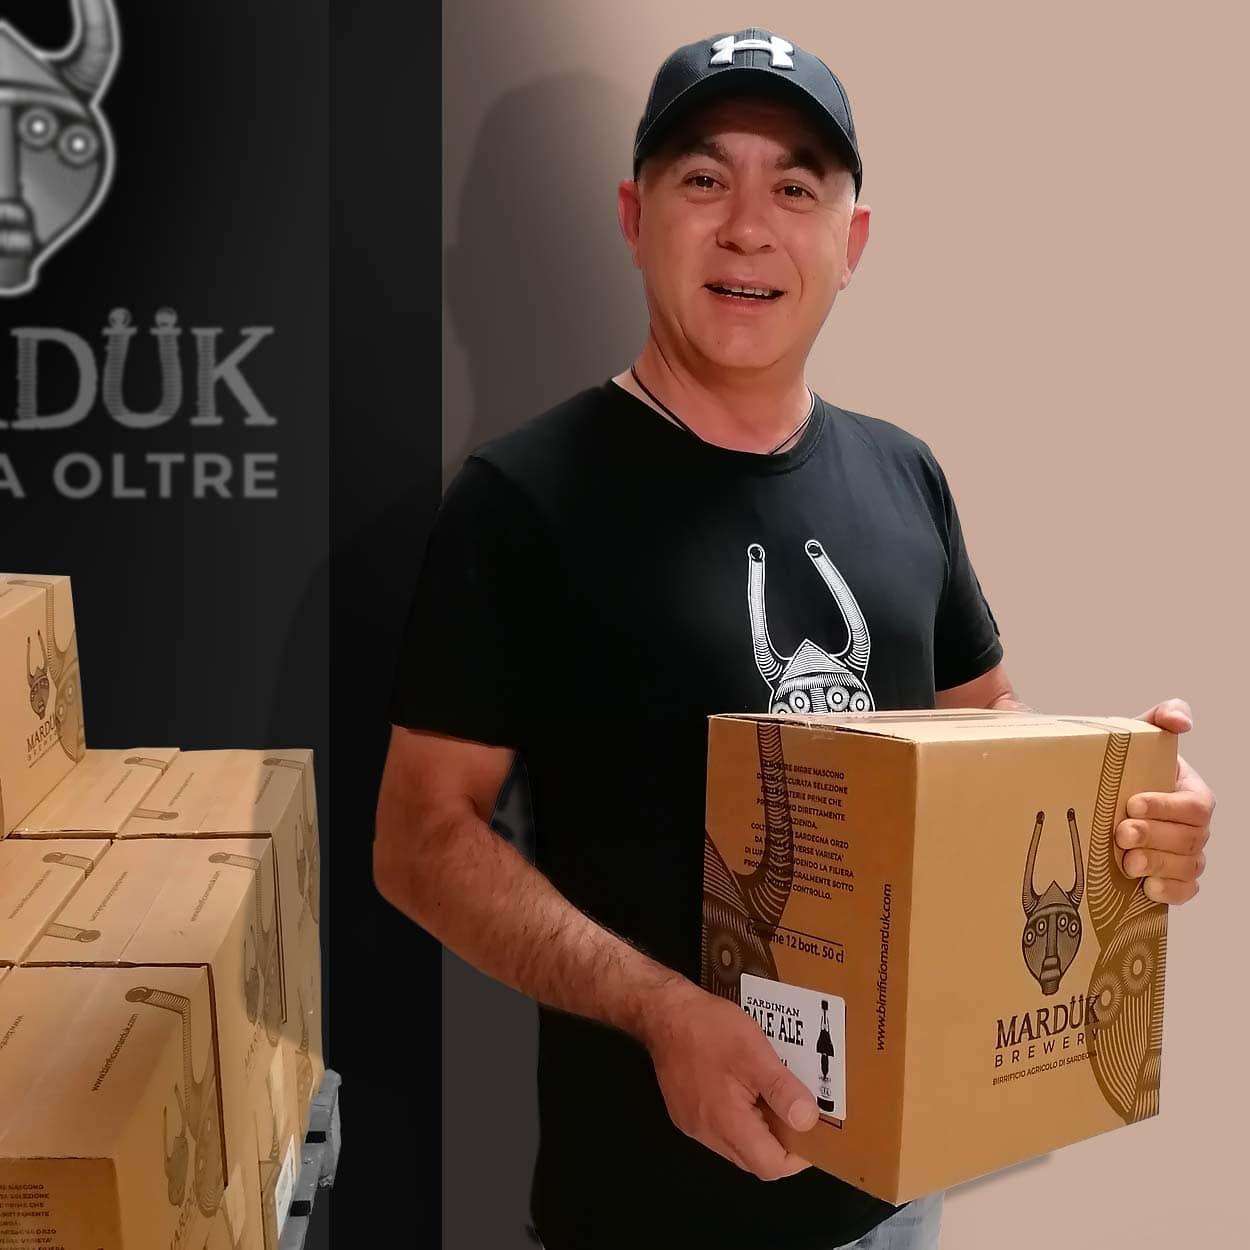 https://www.birrificiomarduk.com/wp-content/uploads/2020/07/021a_Marduk_brewery_birrificio_agricolo_guarda_oltre_birre_Irgoli_Sardegna.jpg